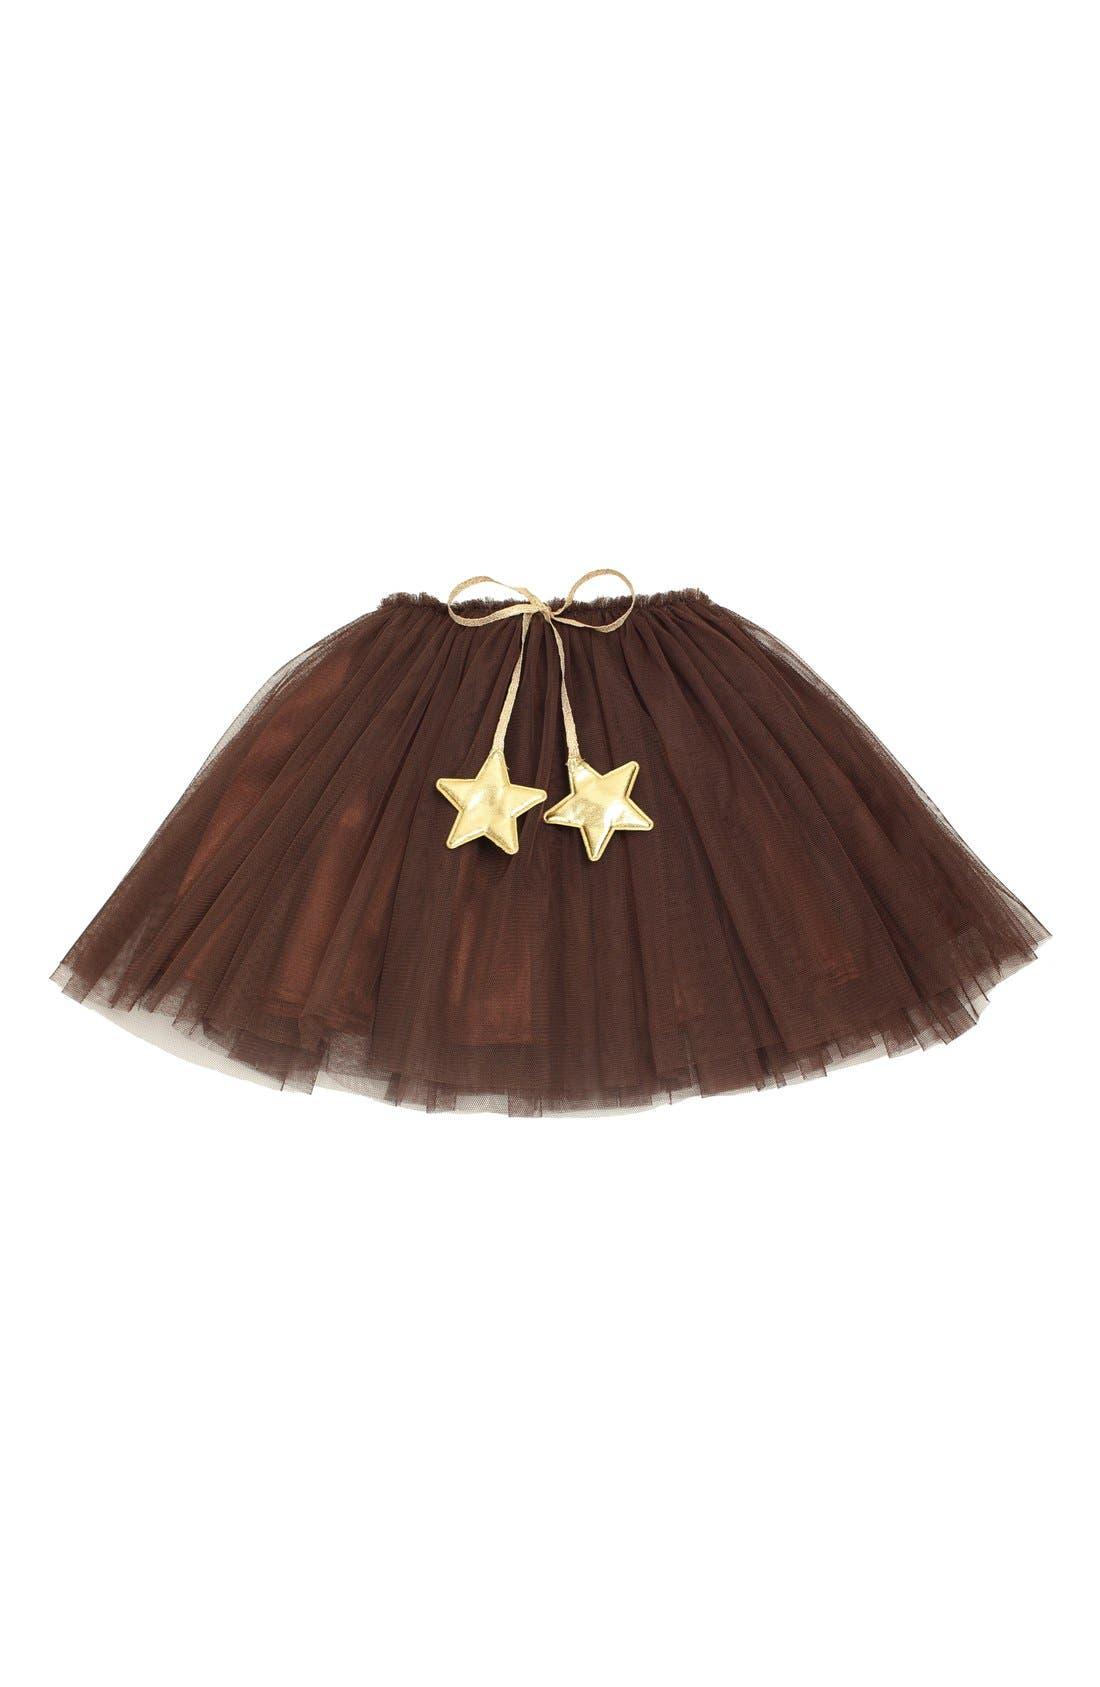 Main Image - POCHEW Star Tutu (Toddler Girls & Little Girls)